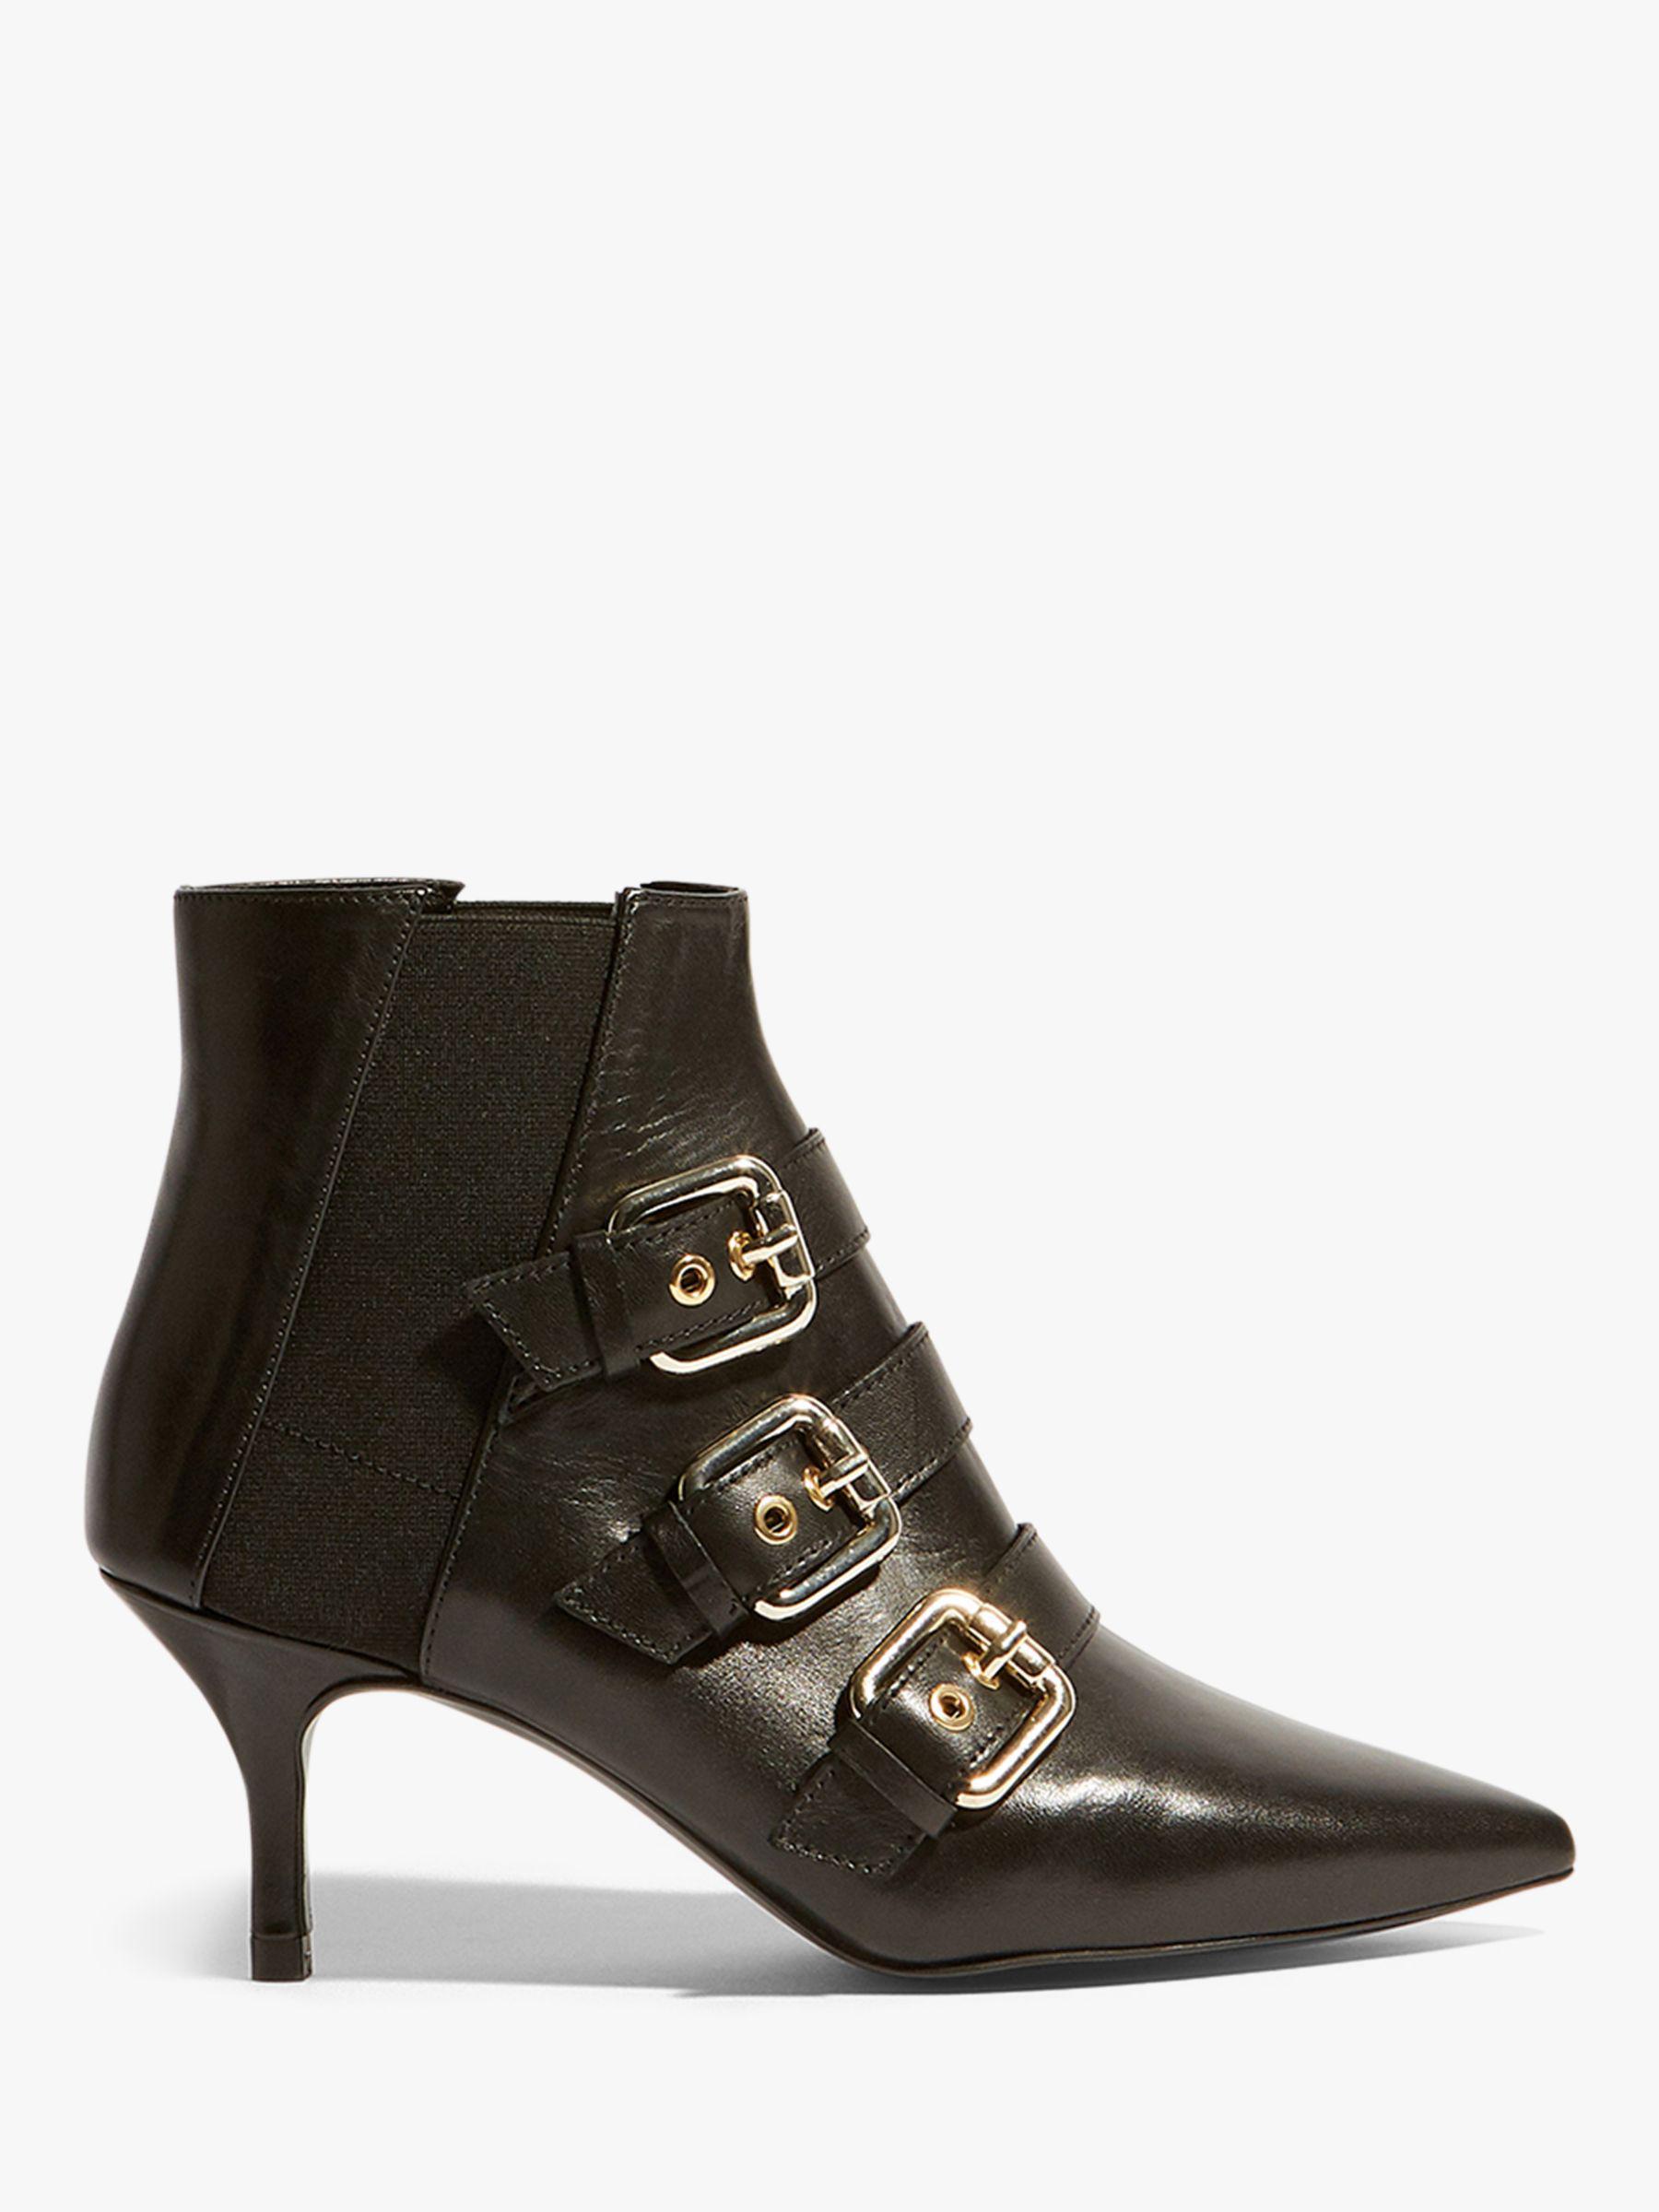 Karen Millen Leather Buckle Detail Kitten Heel Ankle Boots in Black Leather (Black)